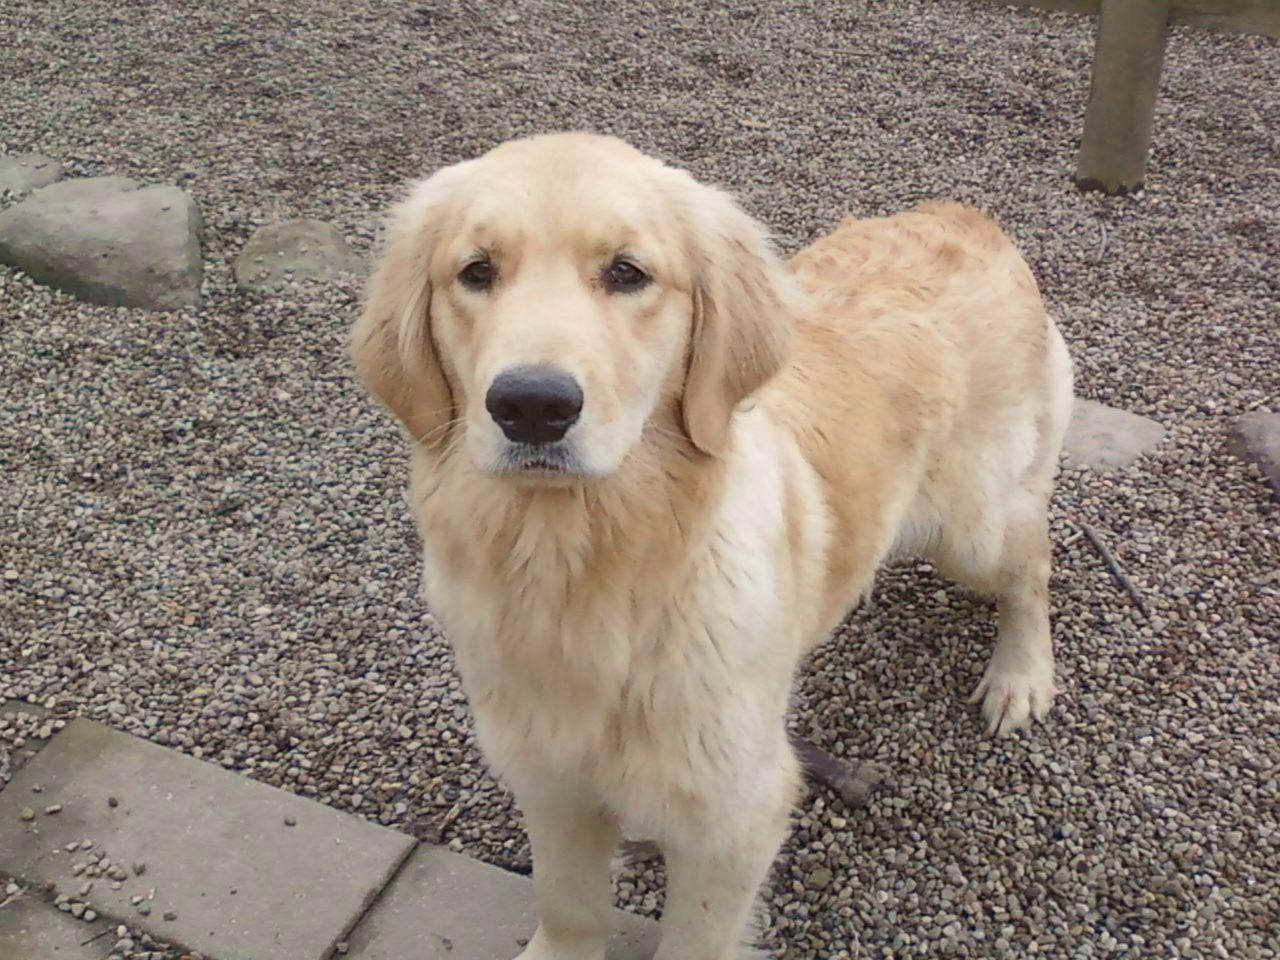 Tumblr In 2020 Dogs Golden Retriever Retriever Puppy Golden Retriever